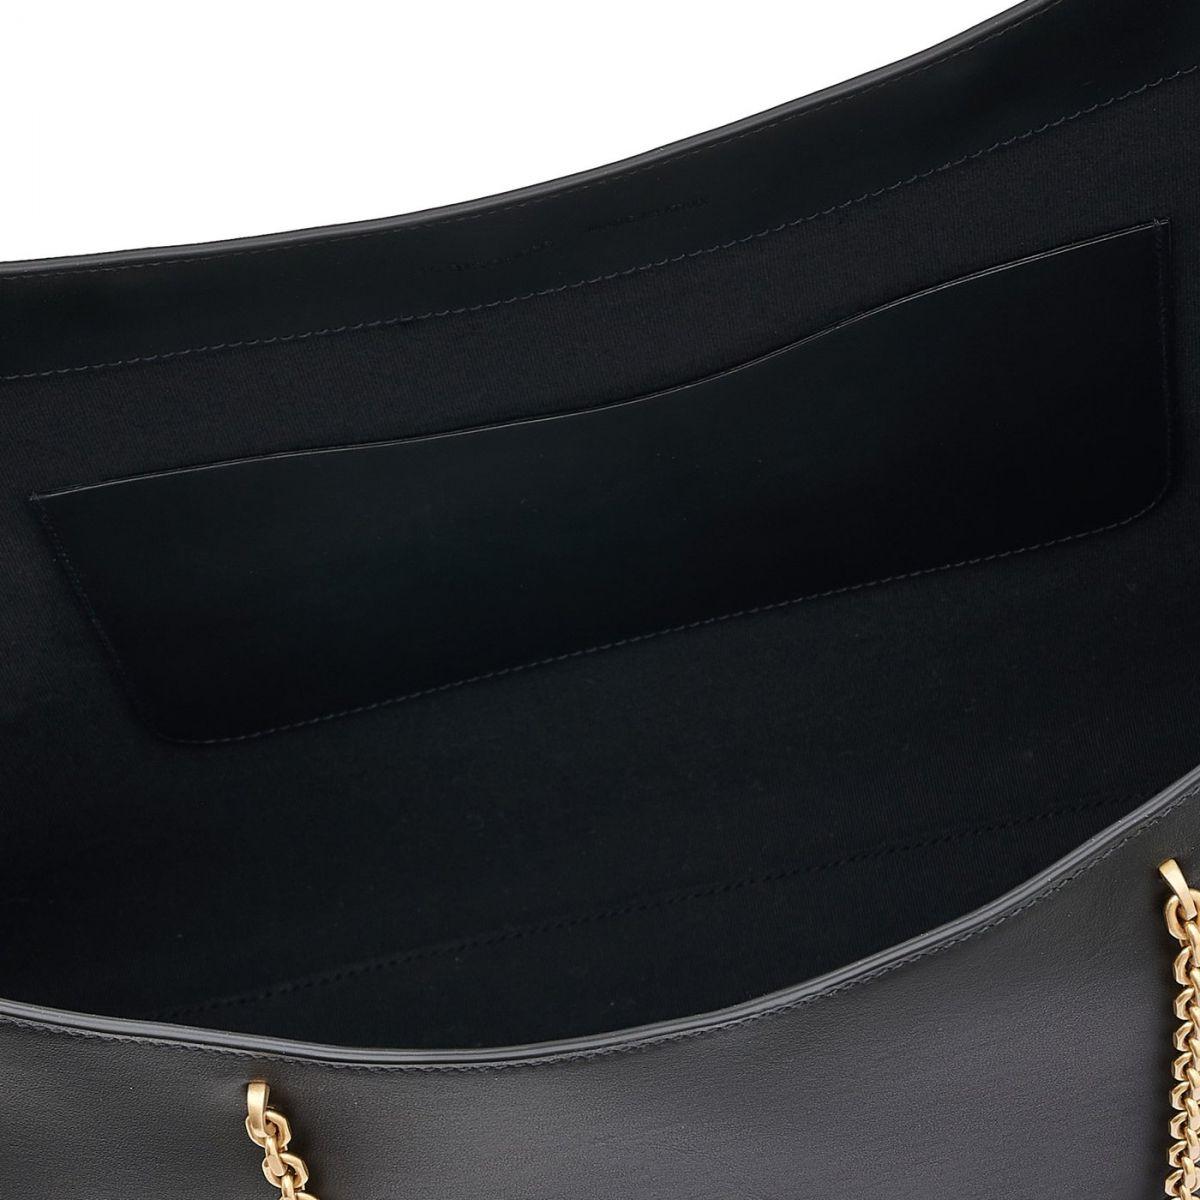 Elba - Women's Tote Bag in Calf Leather color Black - Mediterranea line BTO096 | Details